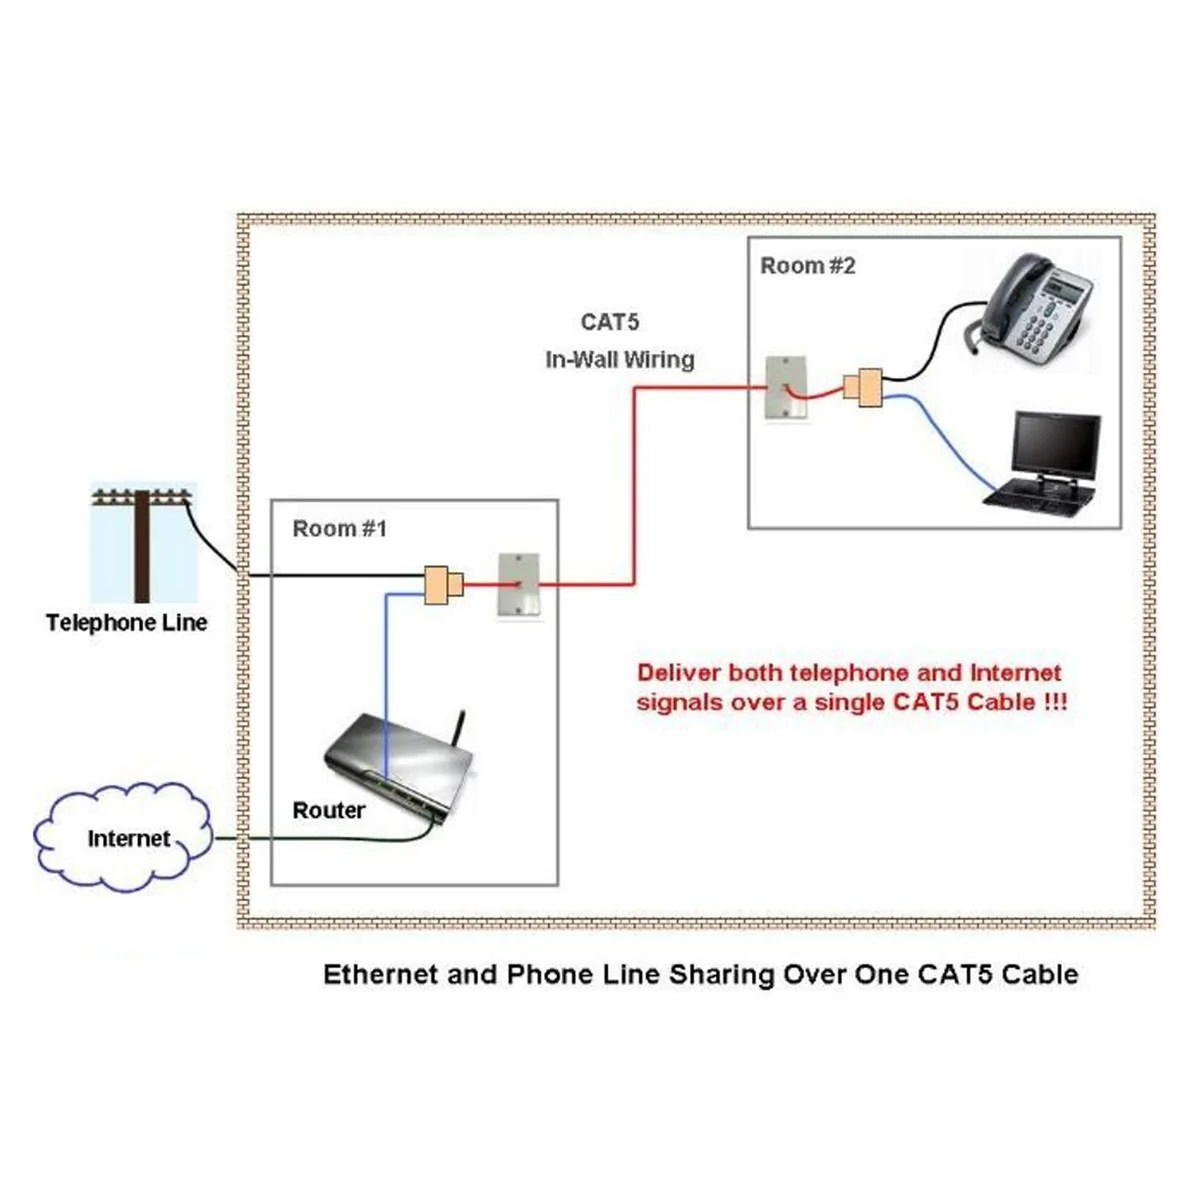 cat 5 phone wire diagram rj45 rj11 splitter cable sharing kit for ethernet and phone linesrj45 rj11 splitter cable sharing kit [ 1200 x 1200 Pixel ]